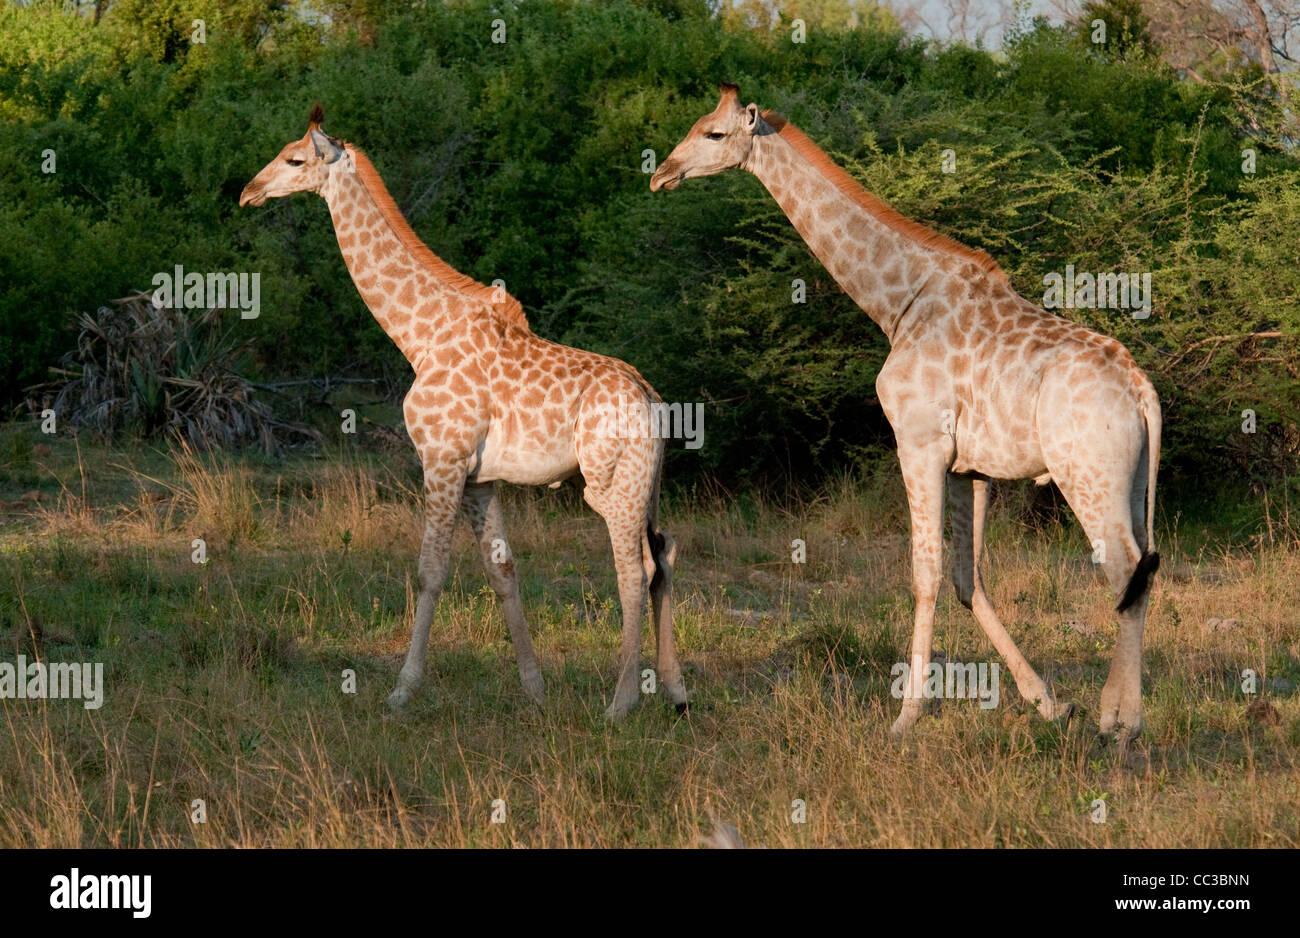 Africa Botswana Tuba Tree-Two South African Giraffes walking (Giraffa camelopardalis) - Stock Image